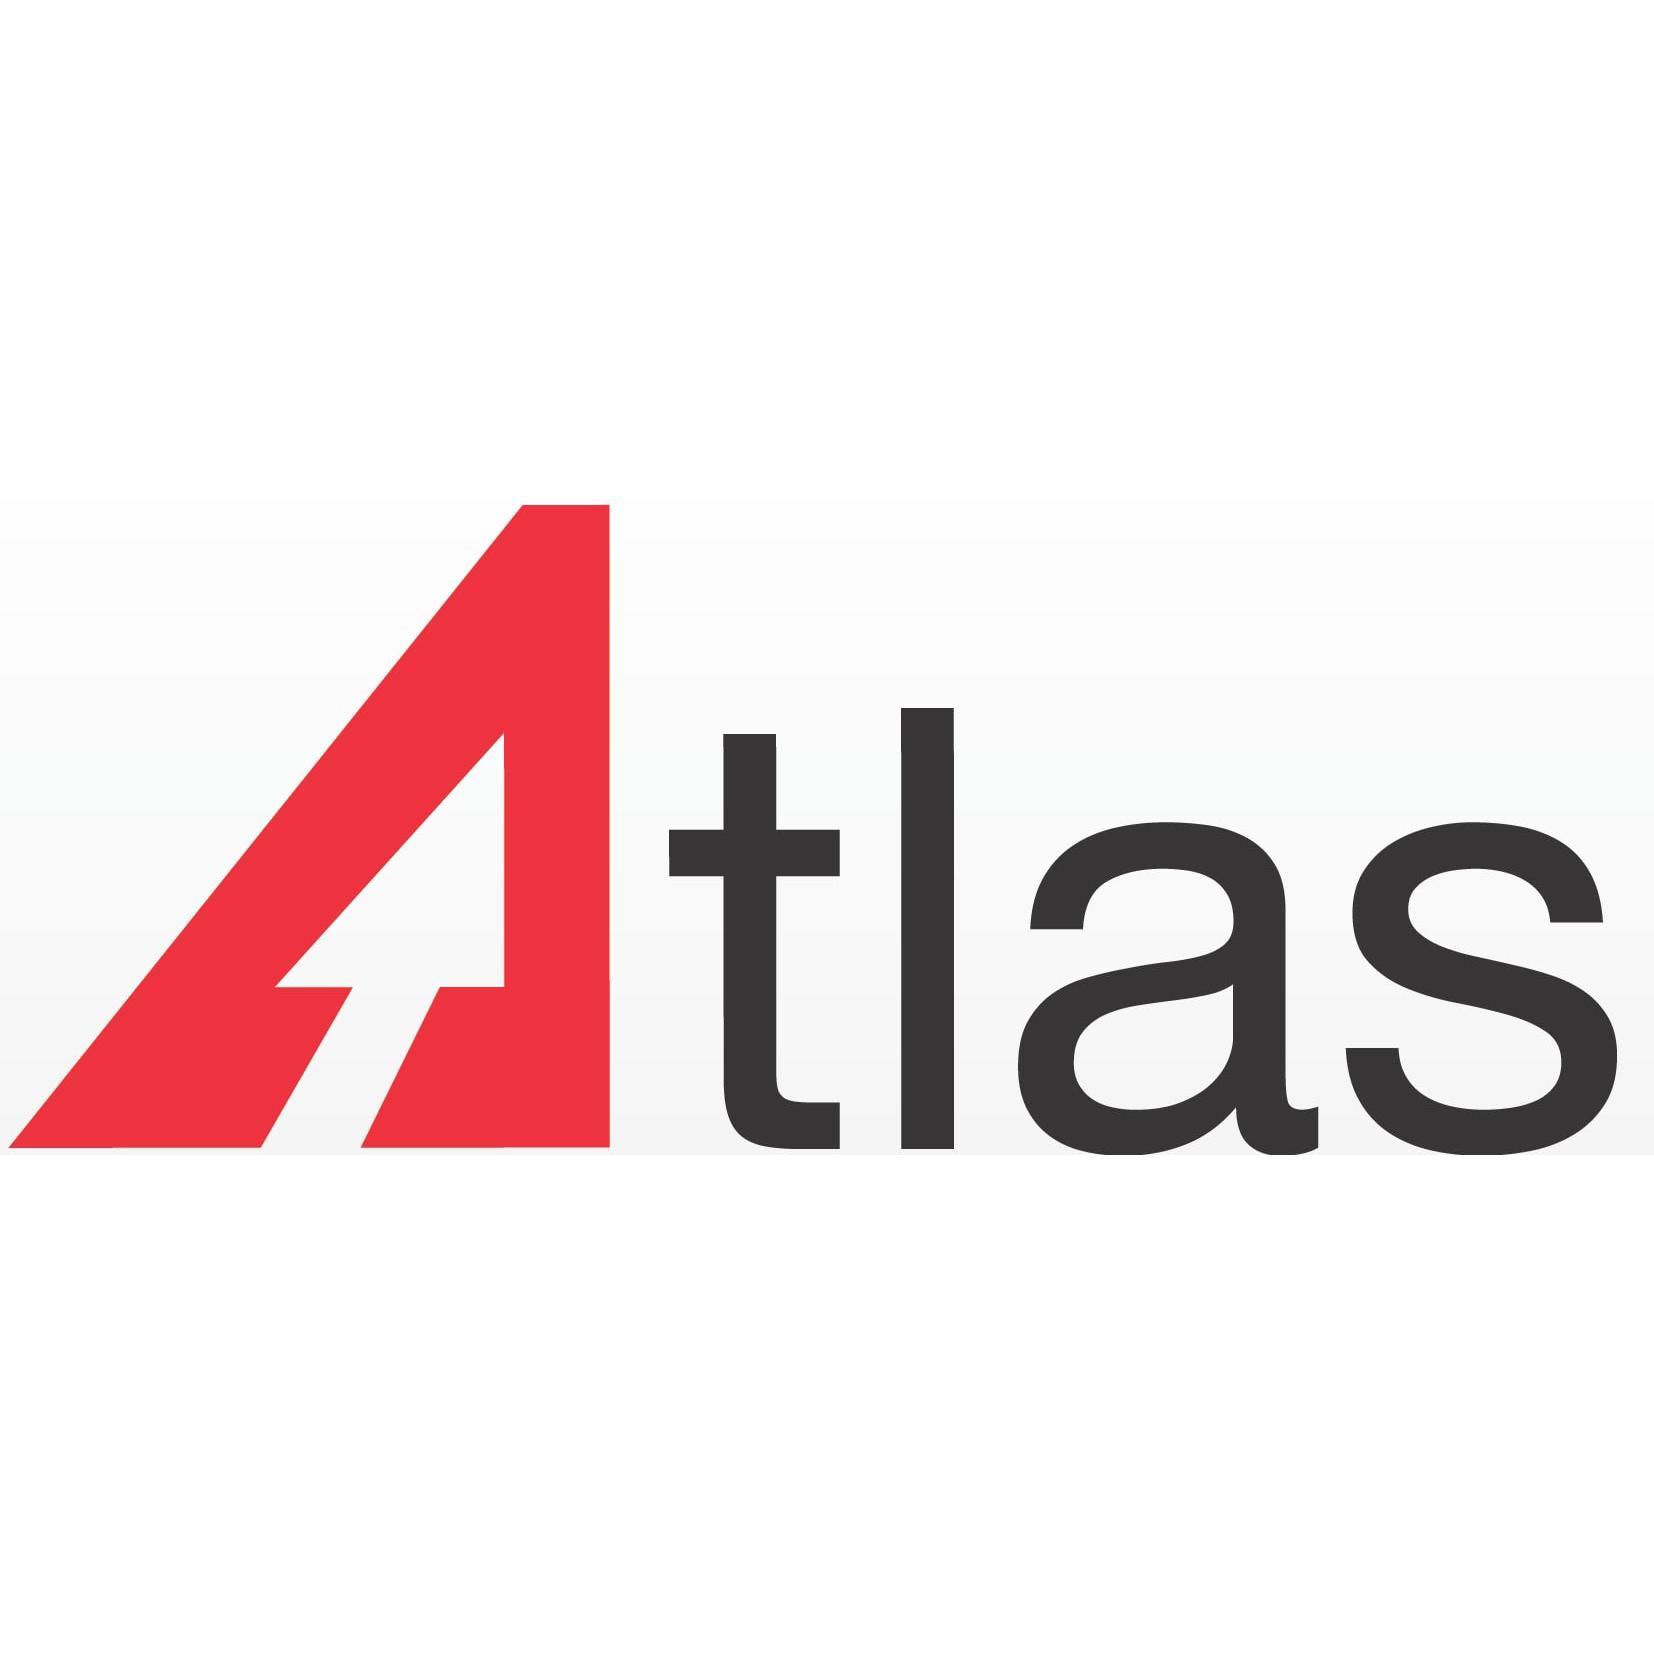 Atlas Motorhome & Campervan Hire - Glasgow, Lanarkshire G3 8BW - 01413 742126 | ShowMeLocal.com